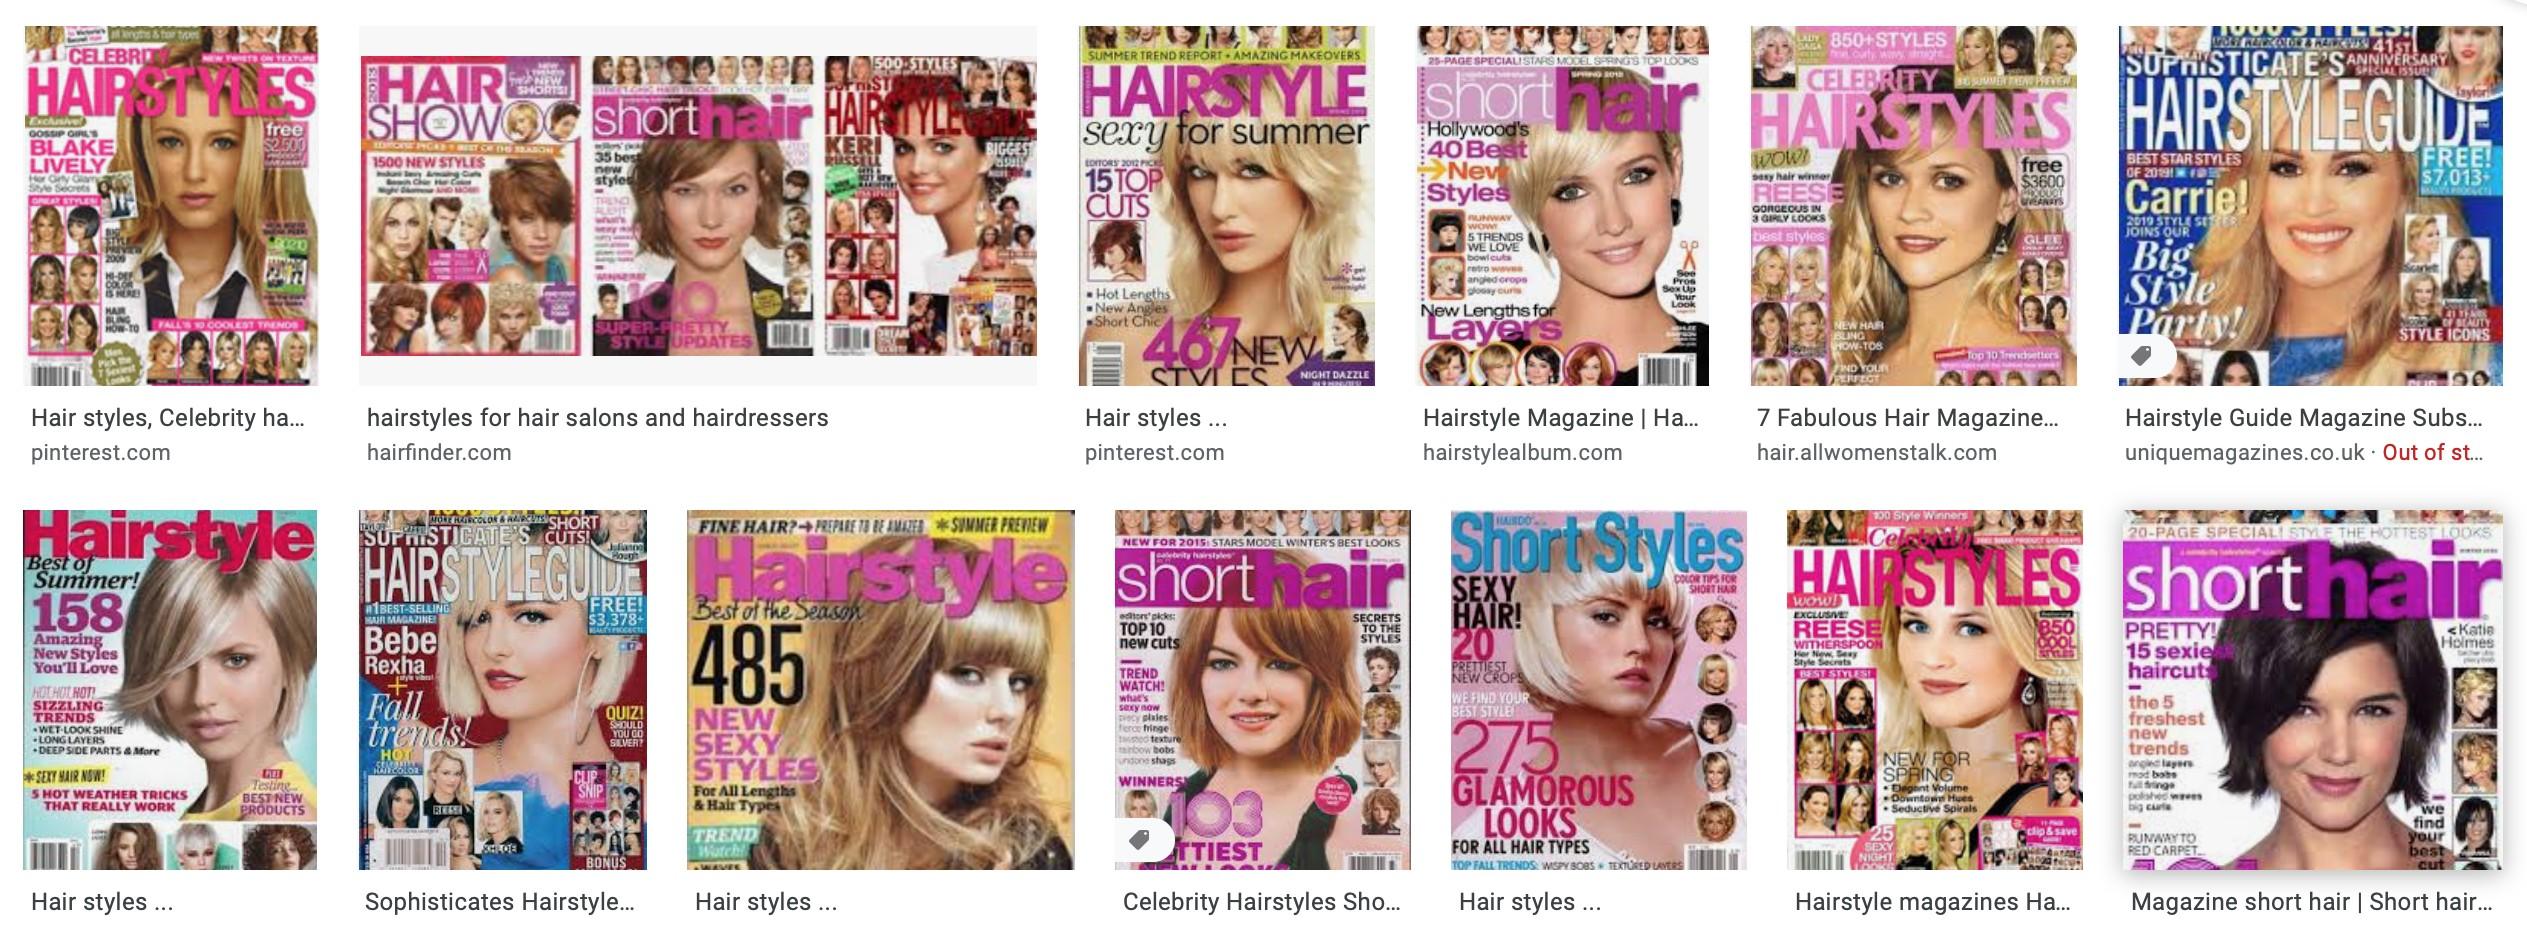 Pixissive Beauty Salon Group Linkedin